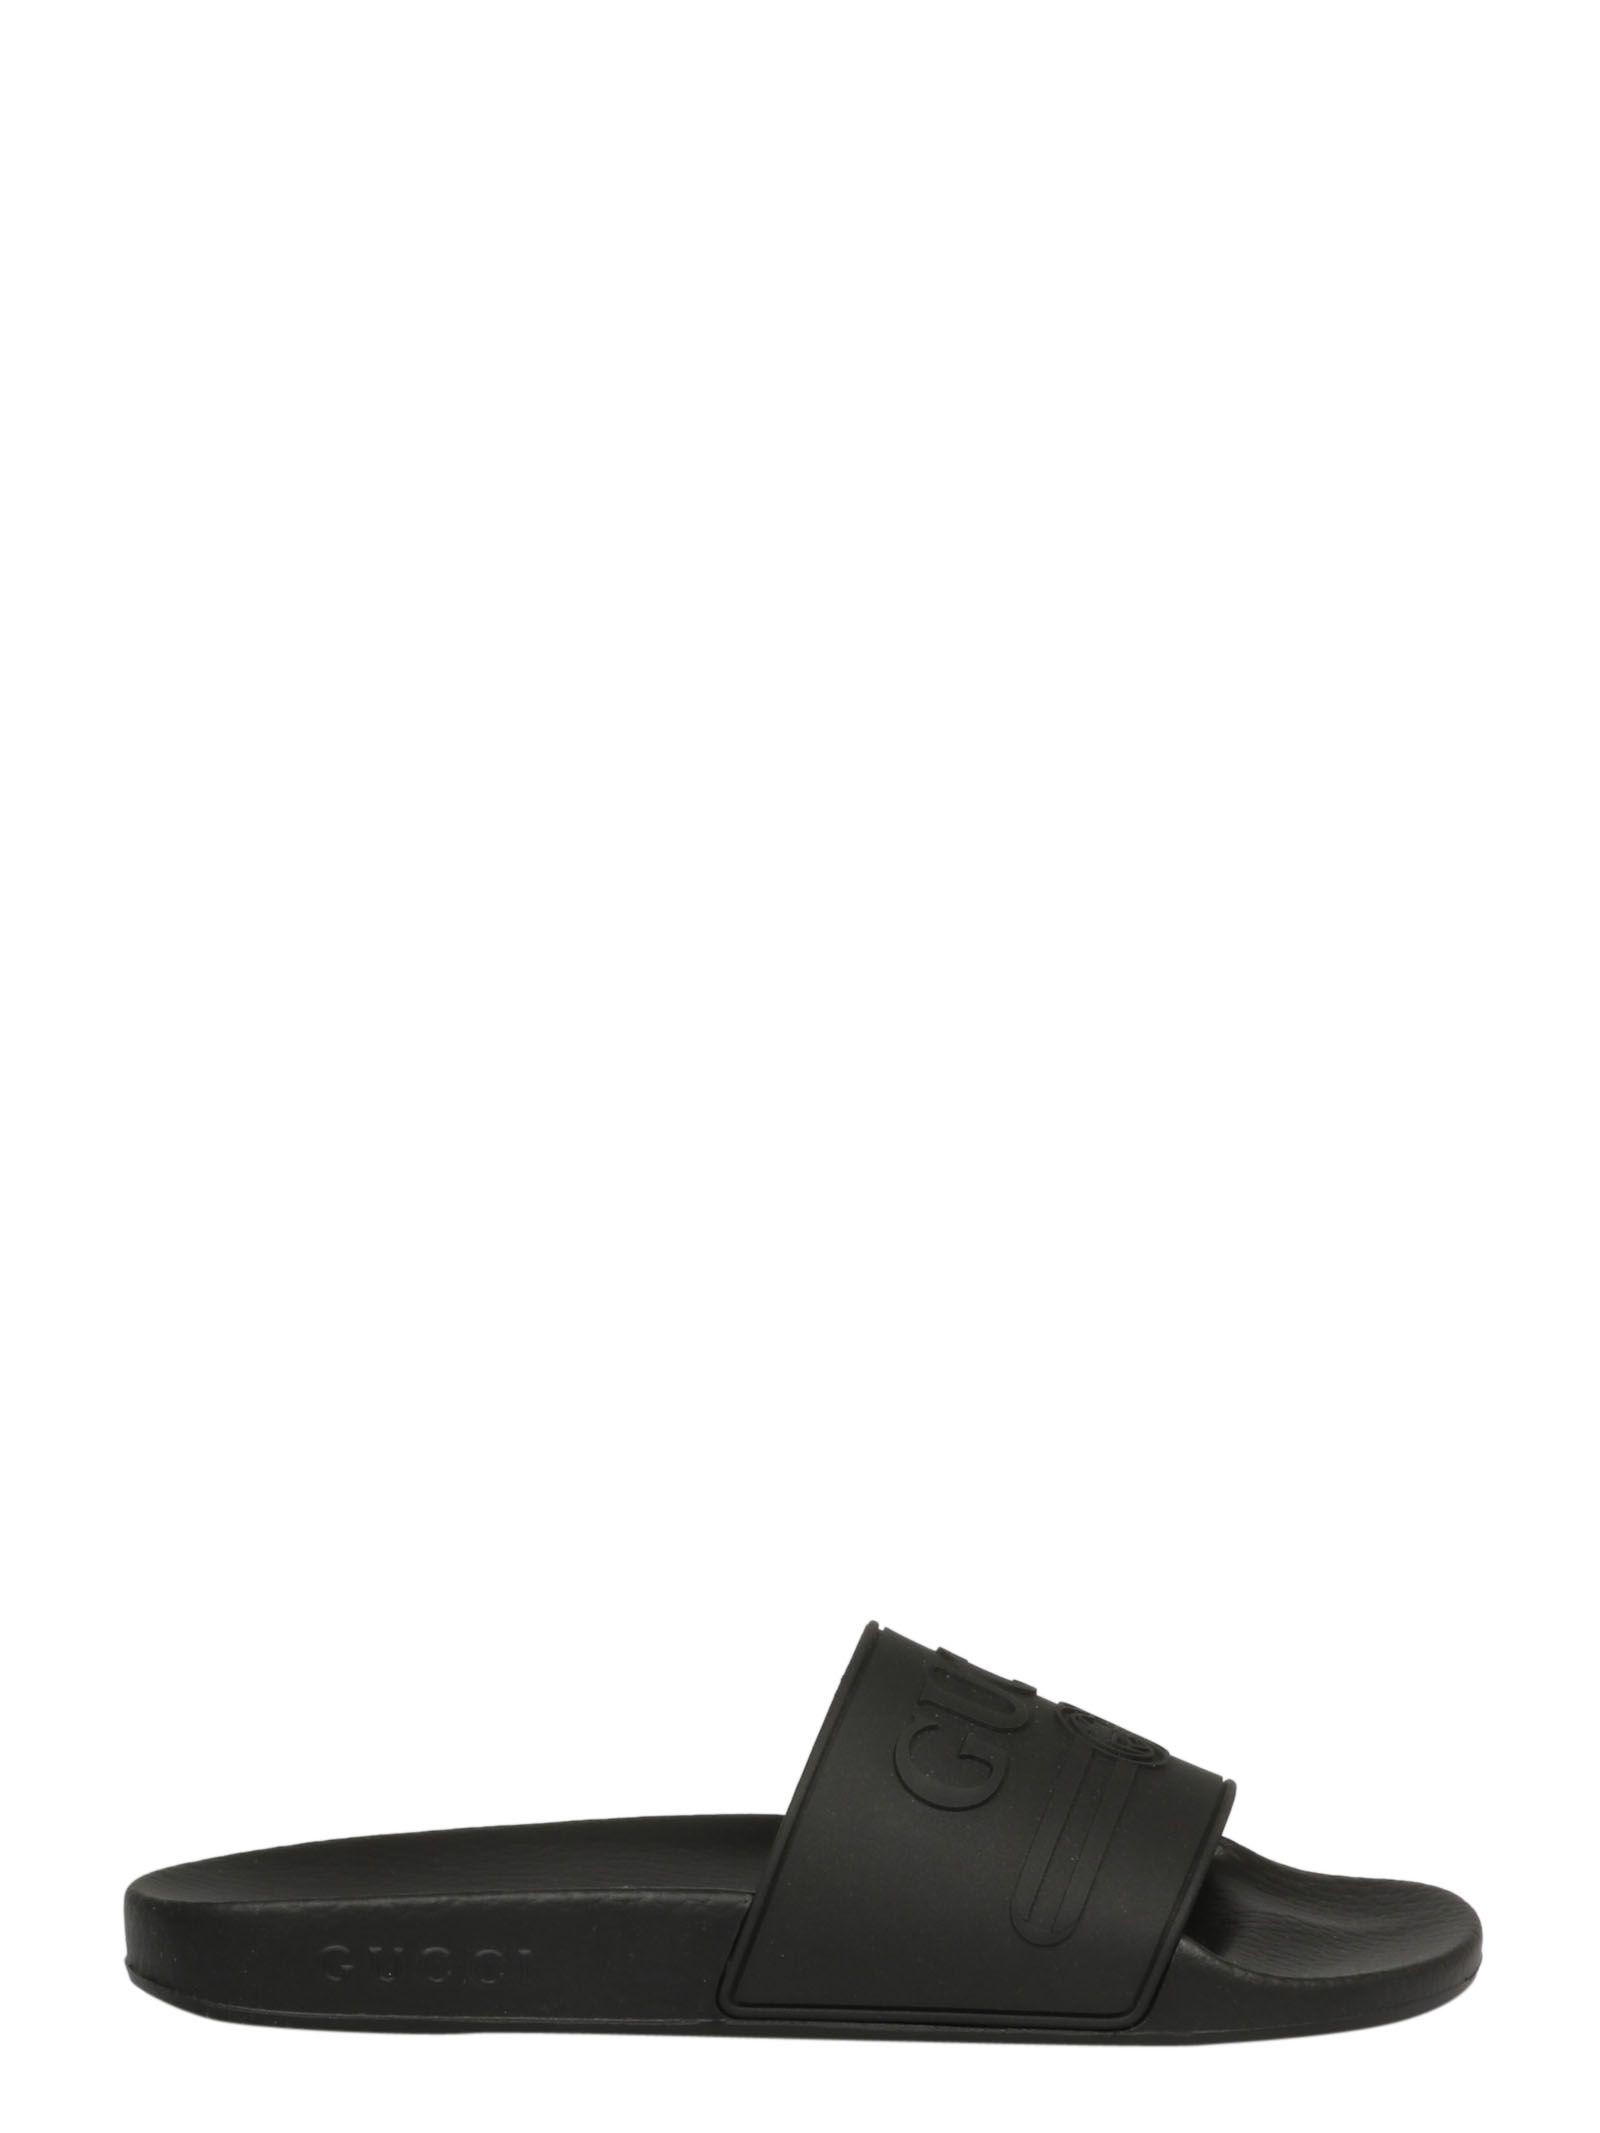 046c0435831097 Shop Gucci Logo Sliders In 1031